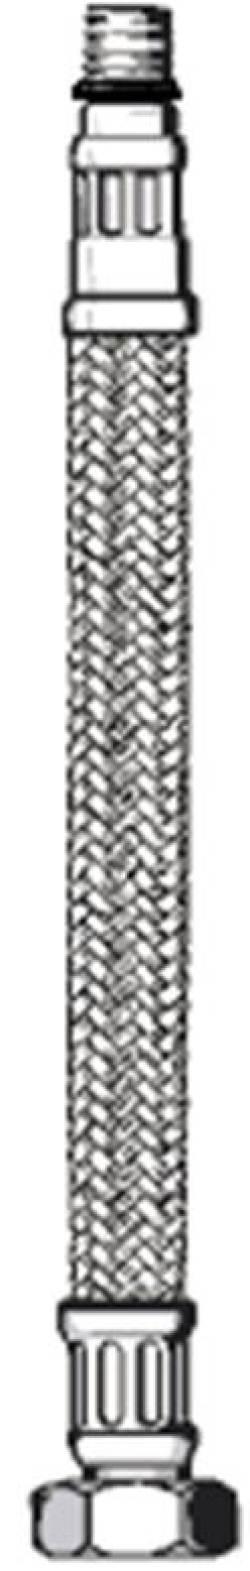 МЕ 5615.3210.30 Meiflex Dn8, М10x1/2ВP, 300mm